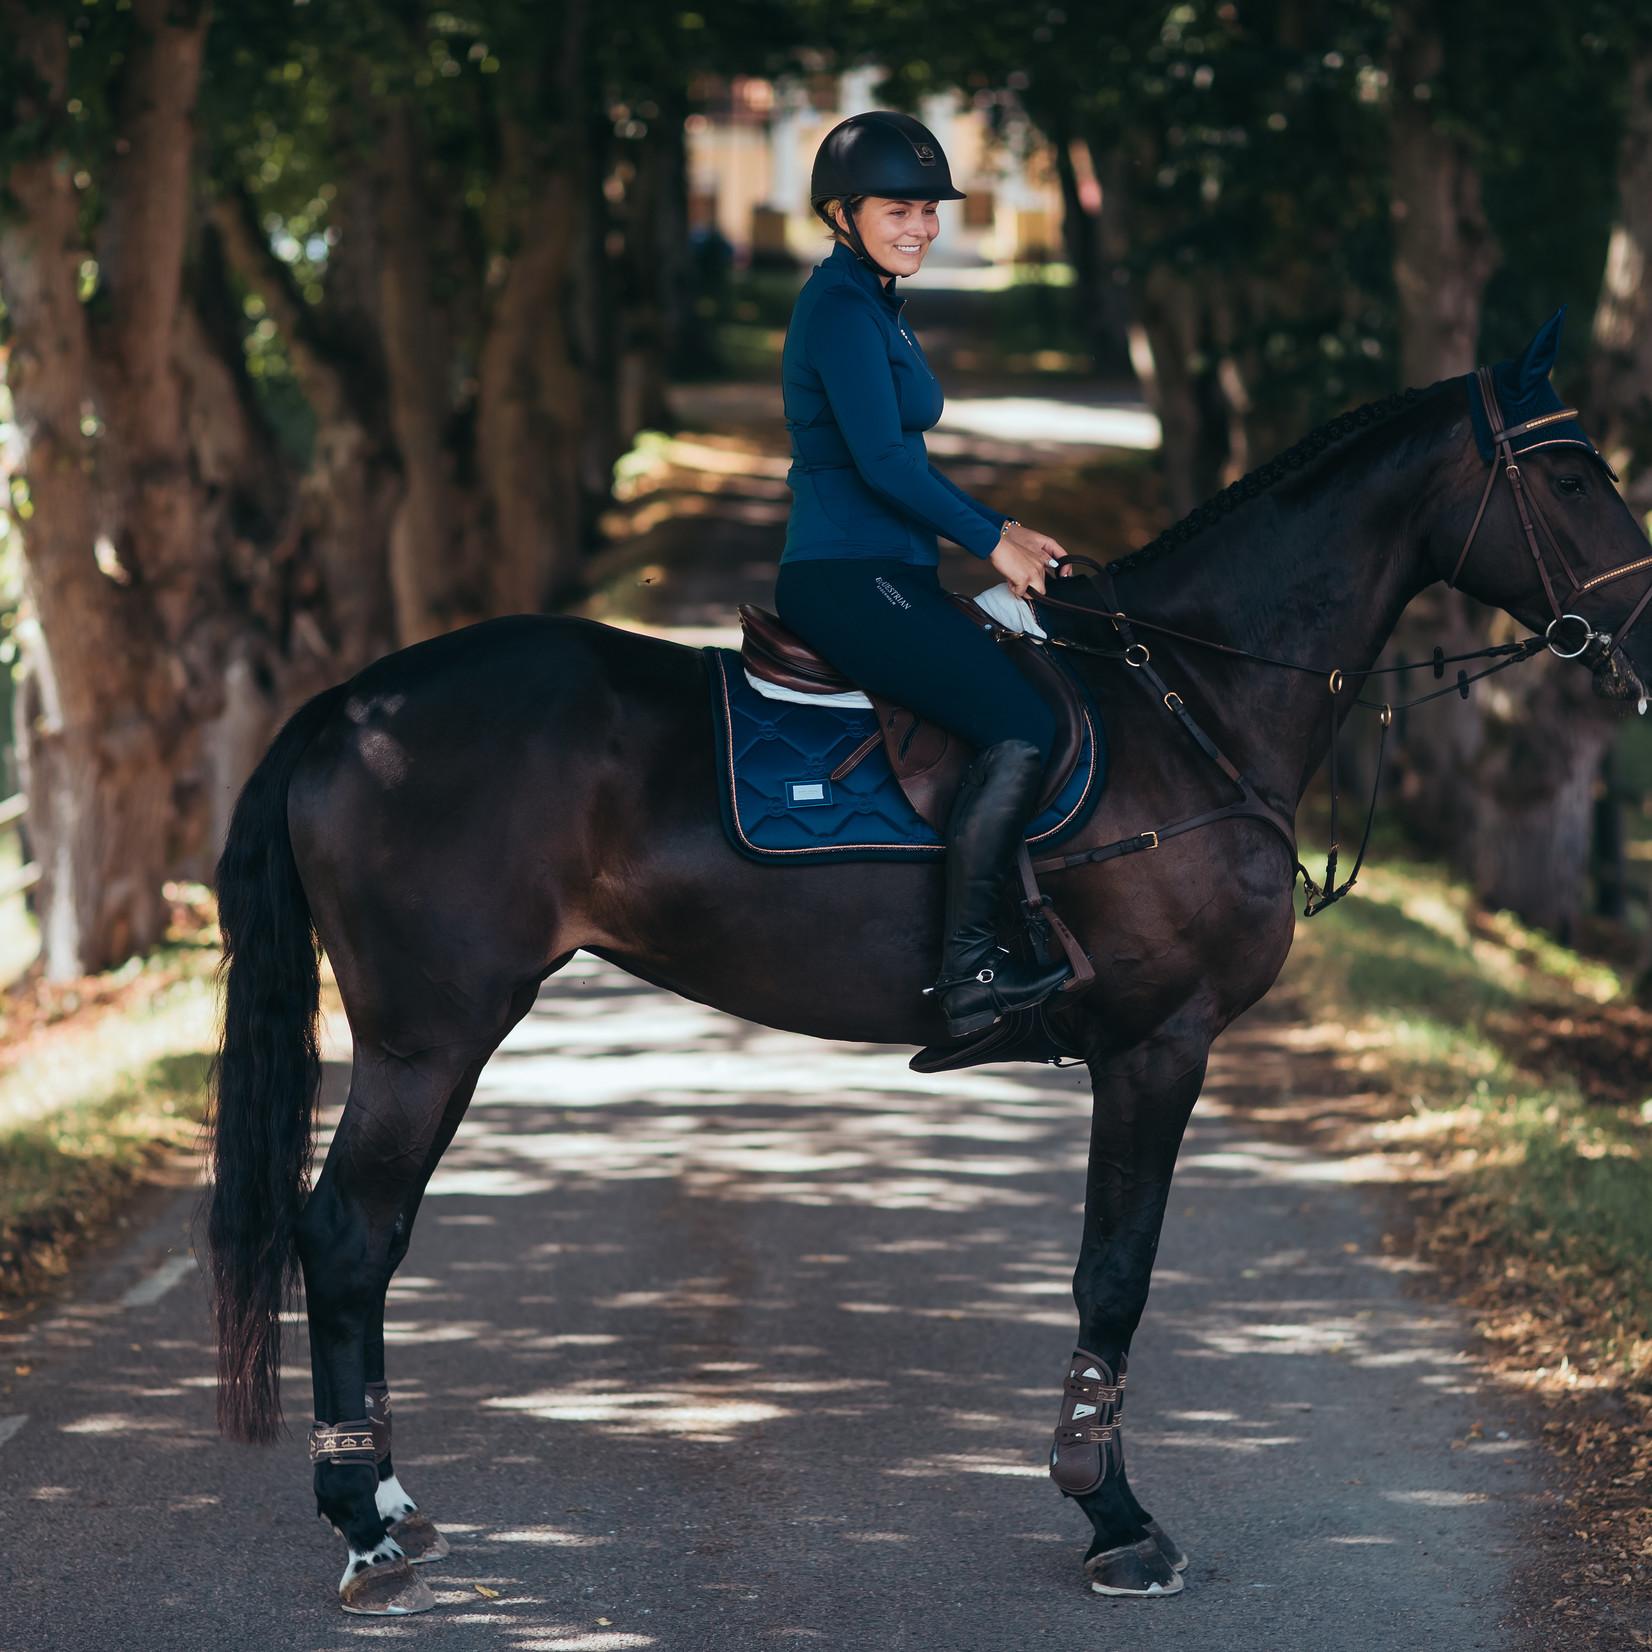 Equestrian Stockholm Saddle Pad Monaco Blue